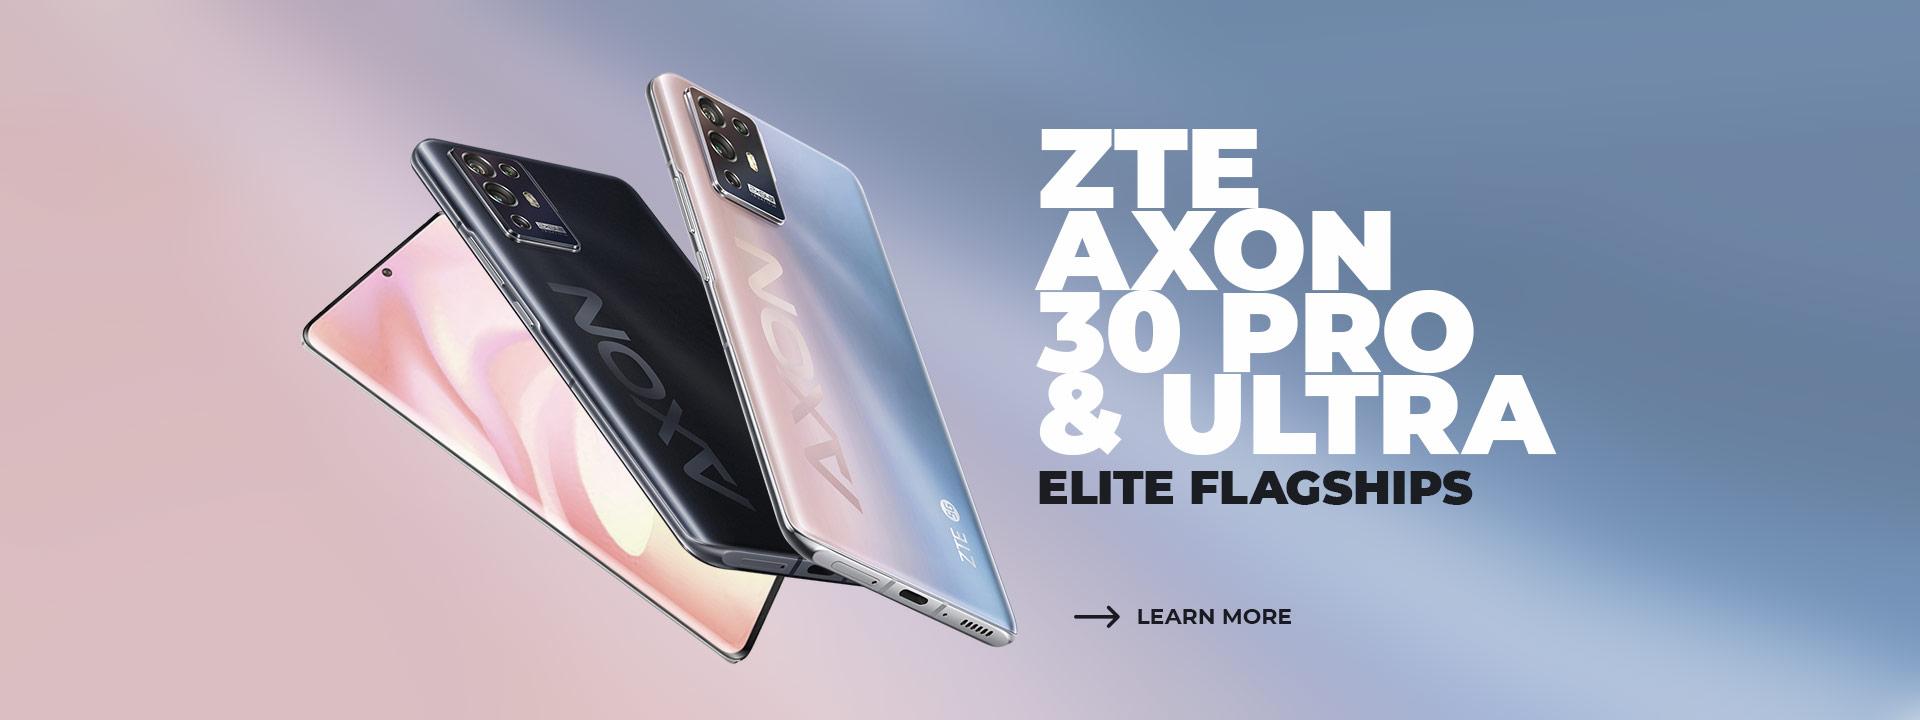 Buy a ZTE smartphone